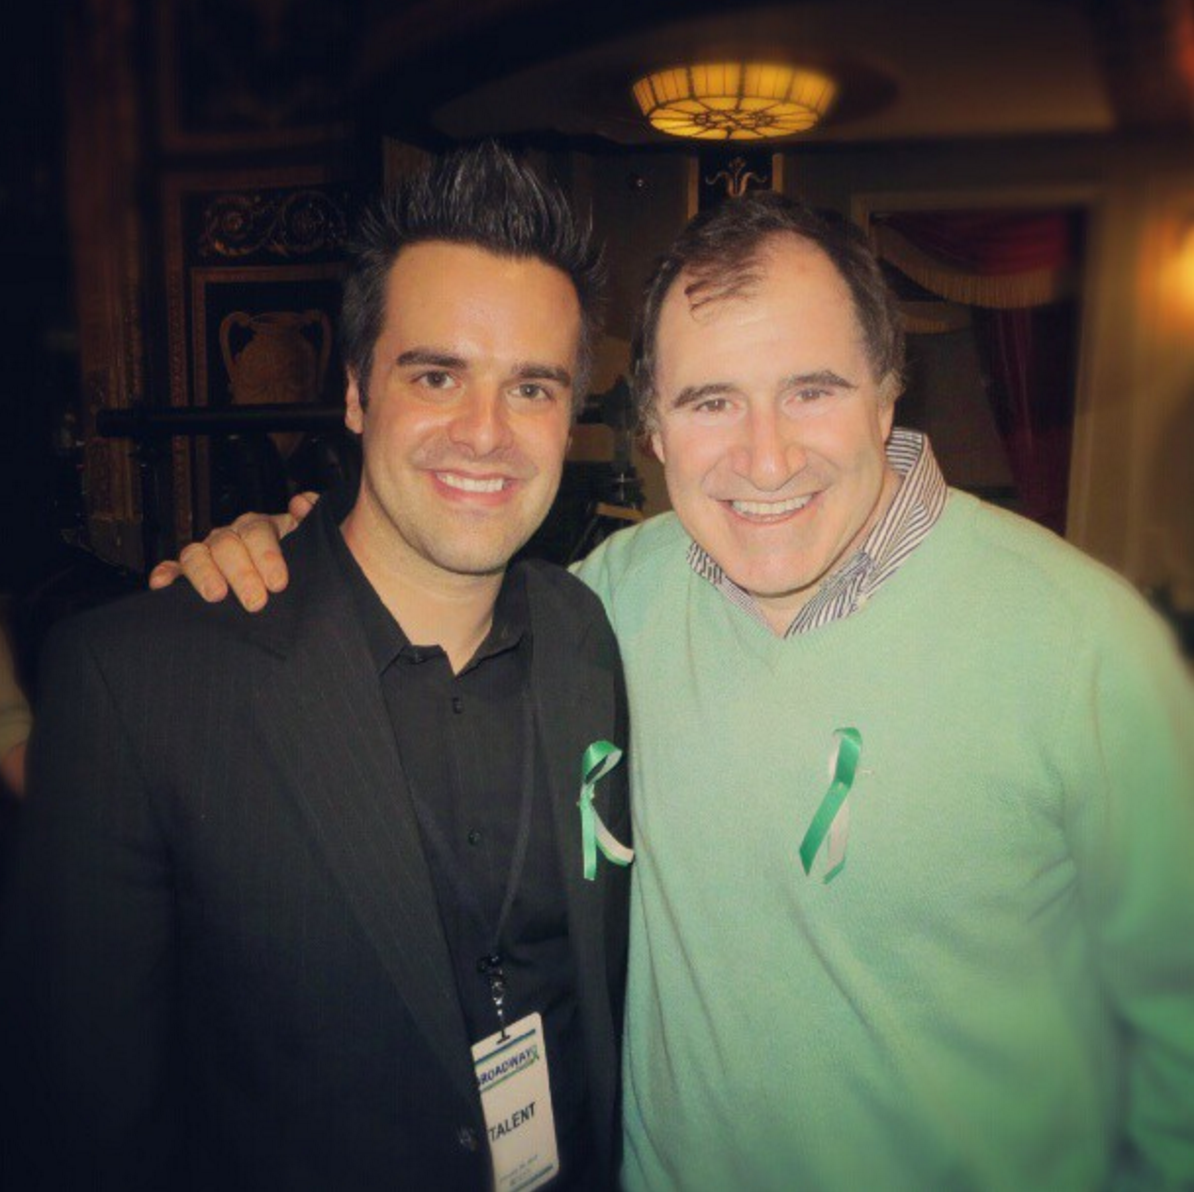 Michael J Moritz Jr with Richard Kind